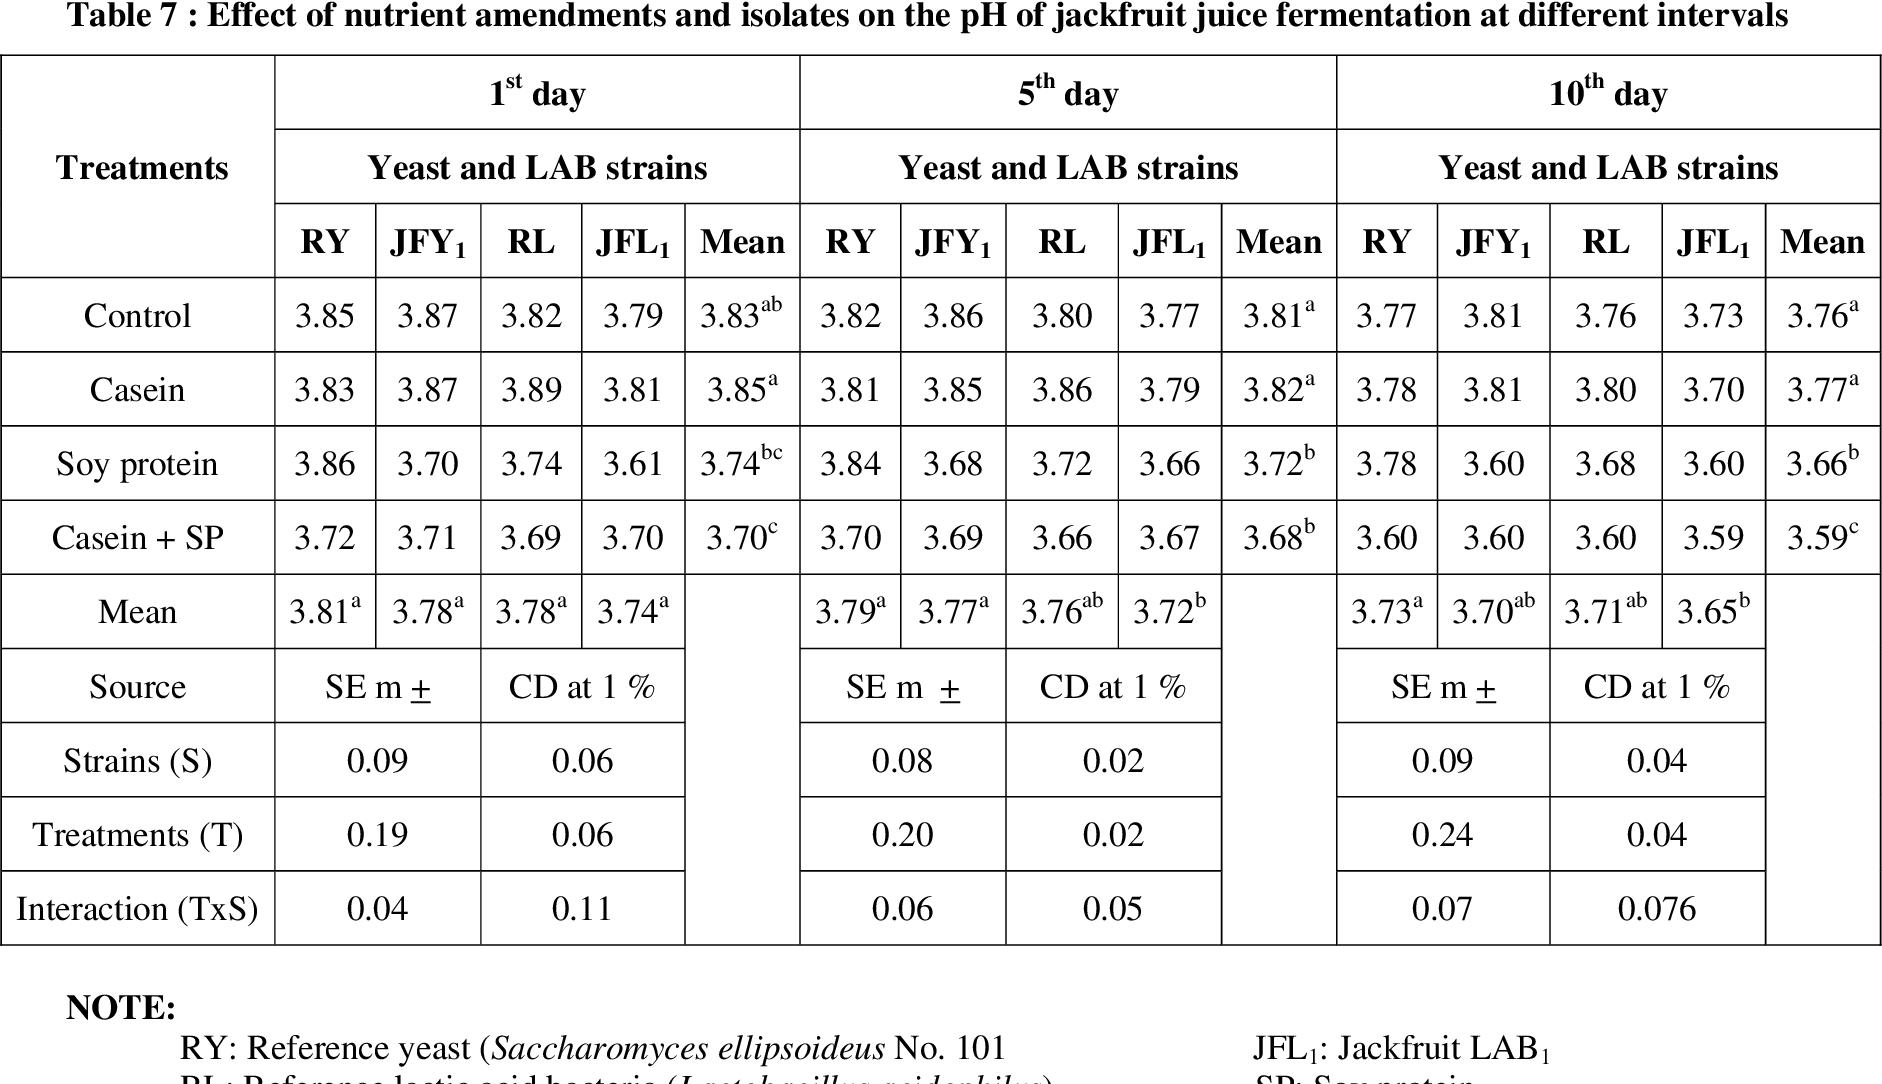 Table 7 from MICROBIAL PROCESSING OF JACKFRUIT (Artocarpus